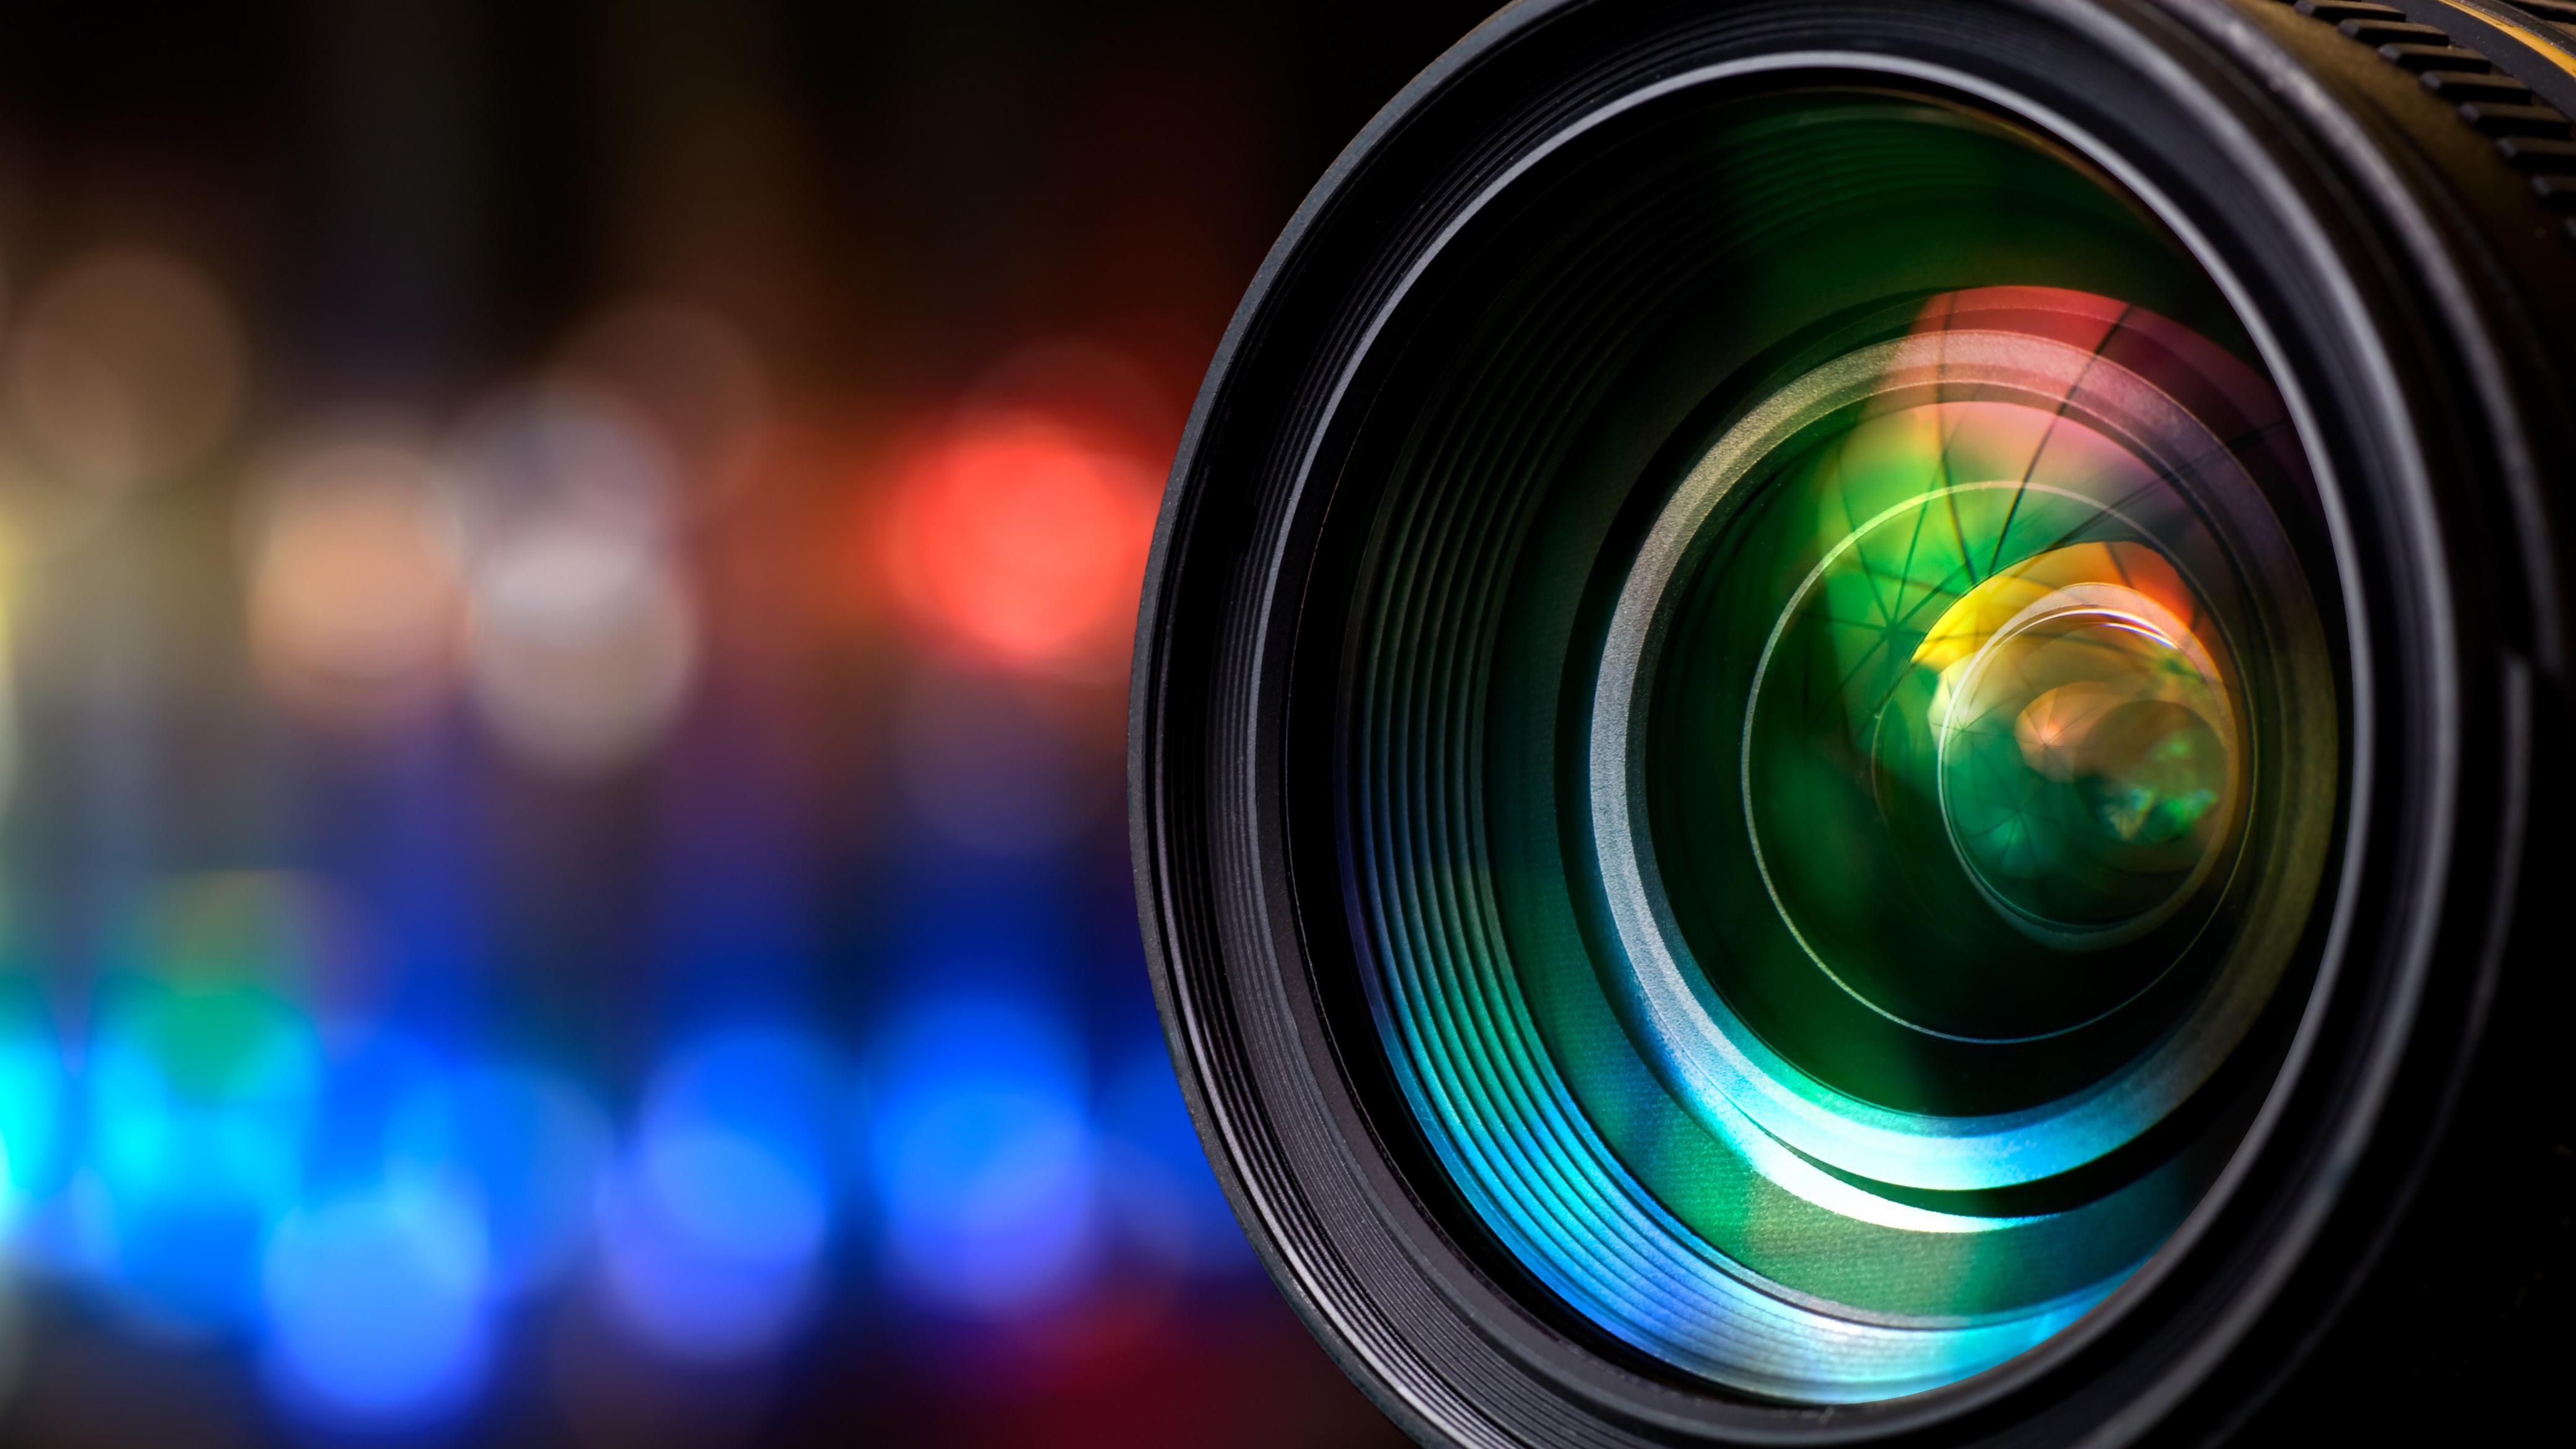 Camera Lens Closeup, HD Photography, 4k Wallpapers, Images ...